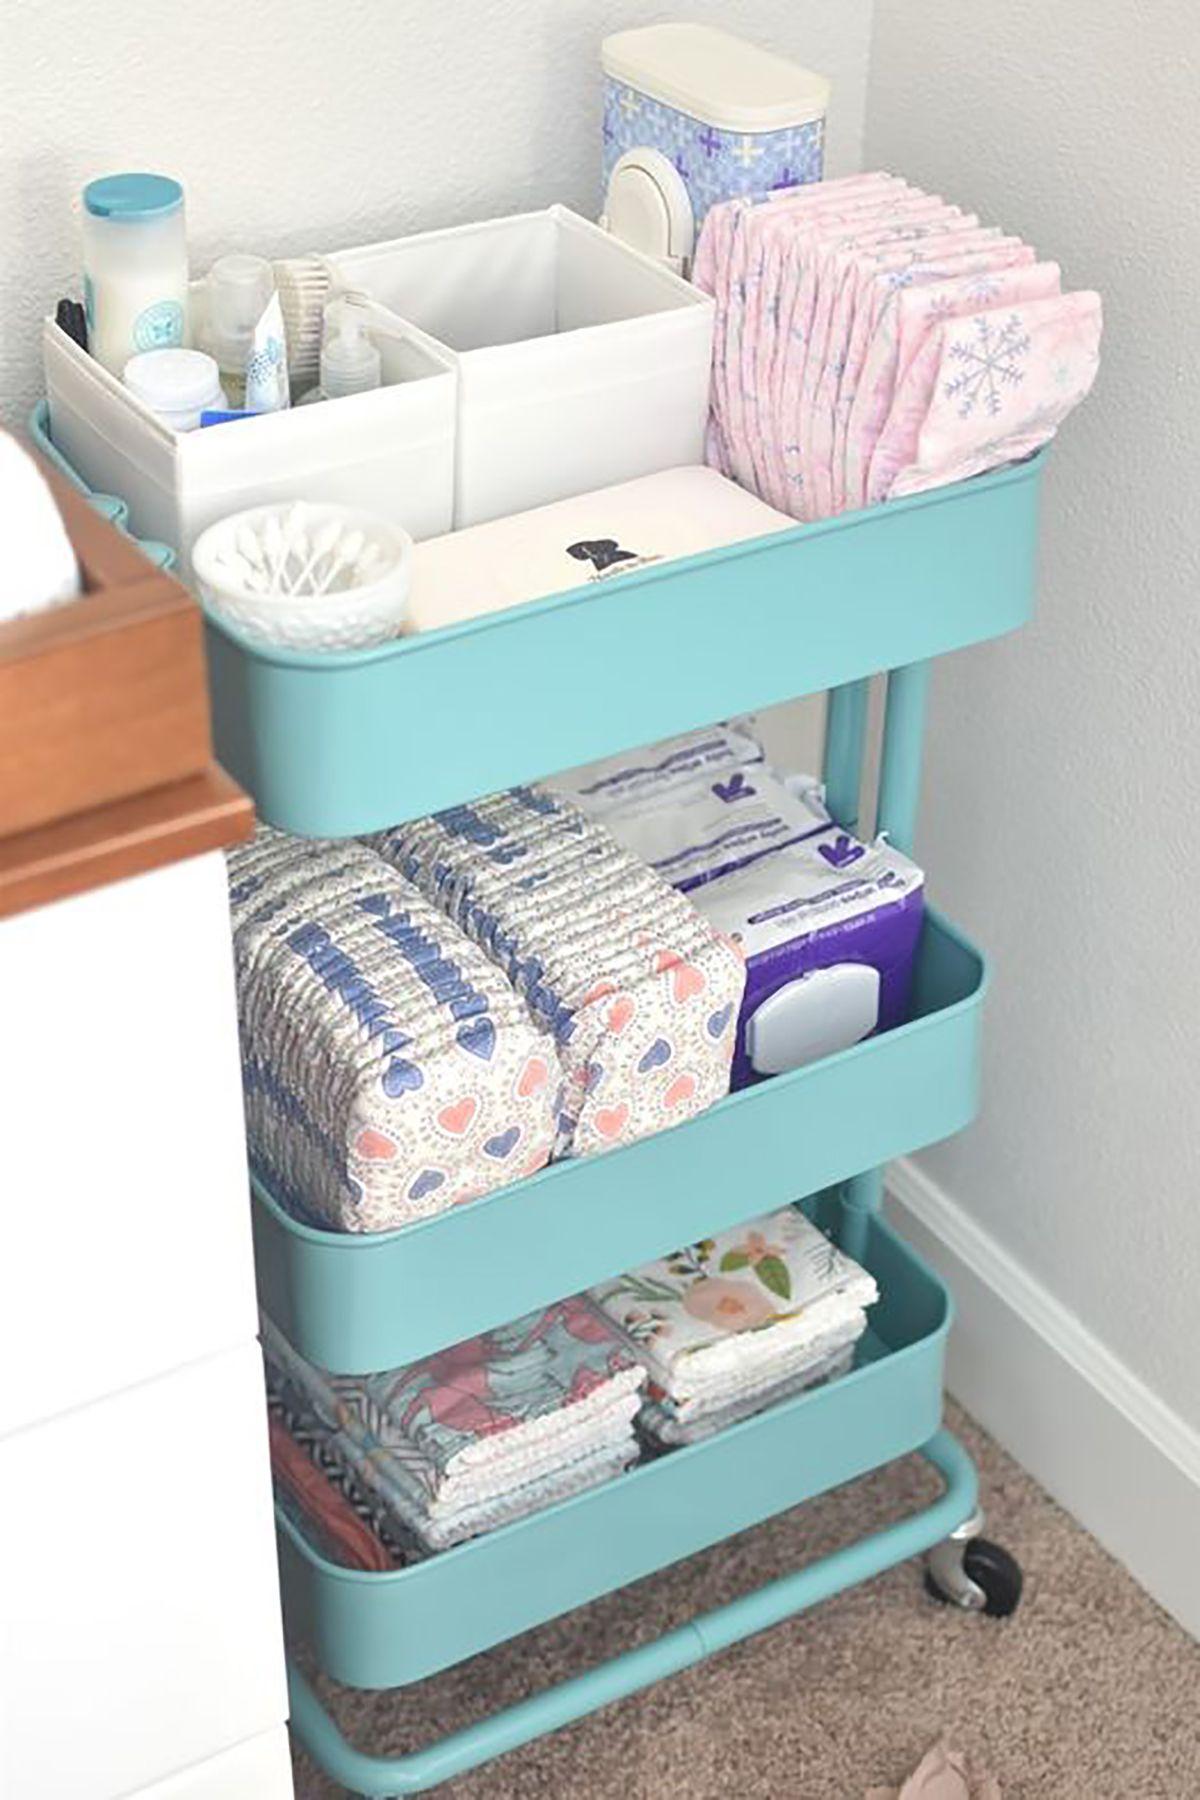 20 Best Baby Room Ideas - Nursery Design, Organization, And Storage Tips